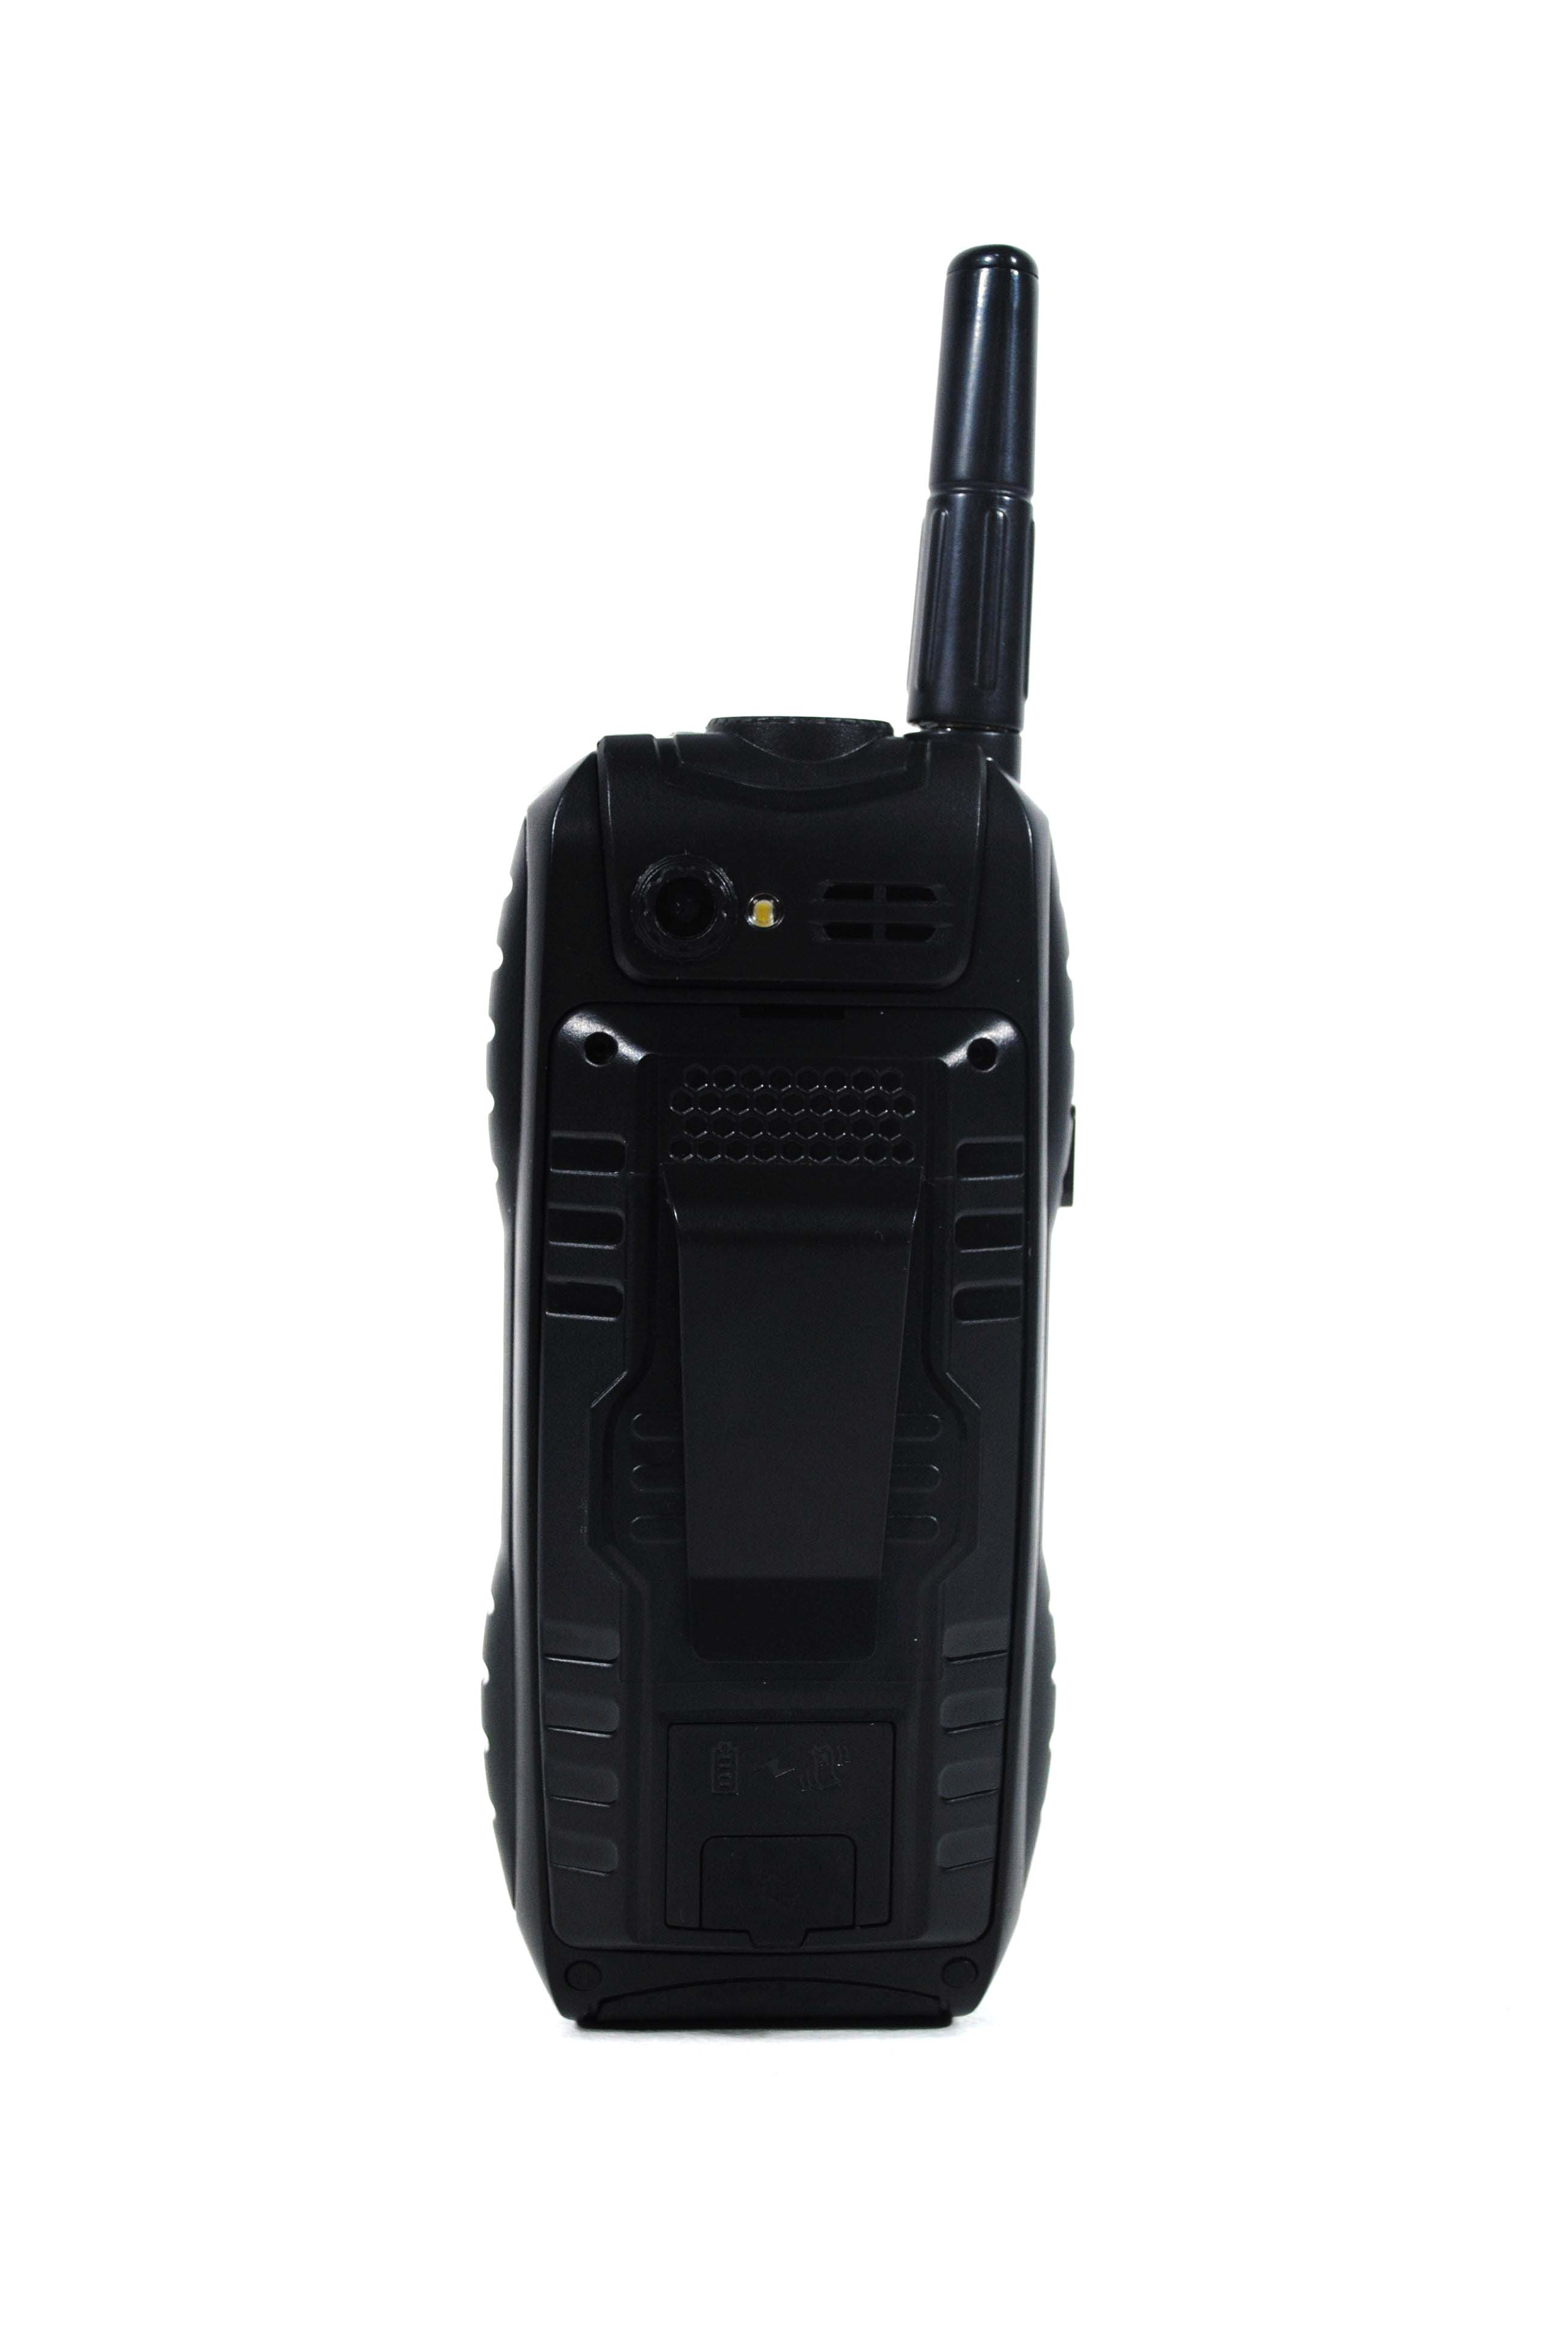 موبايل Hope S15 بطارية 10000 ملي أمبير